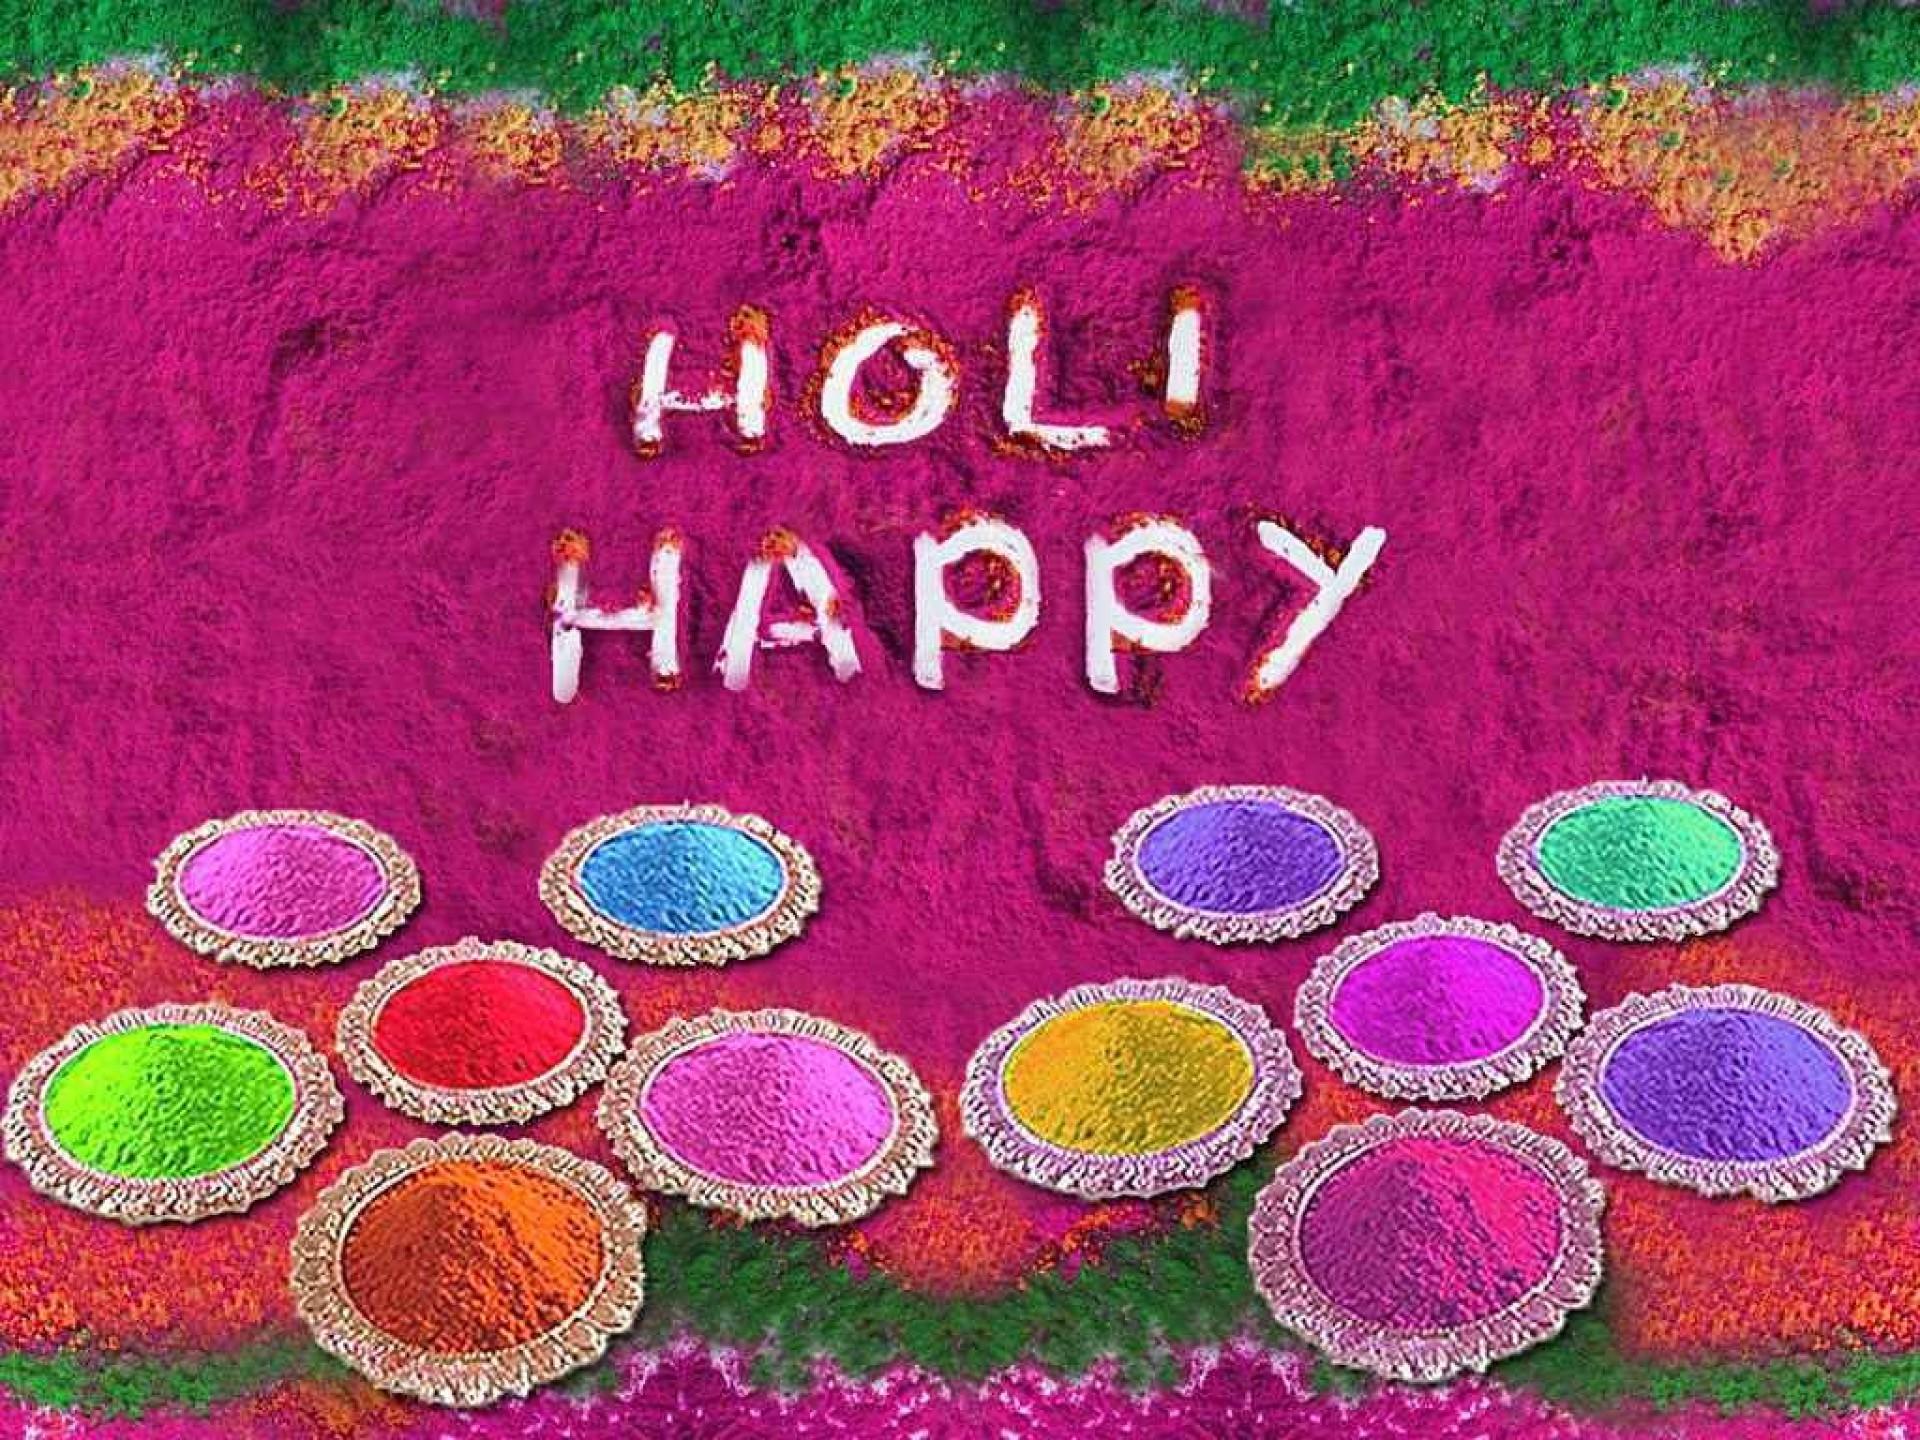 005 Holi Festival Essay Happy Wallpaper Top In Punjabi 1920